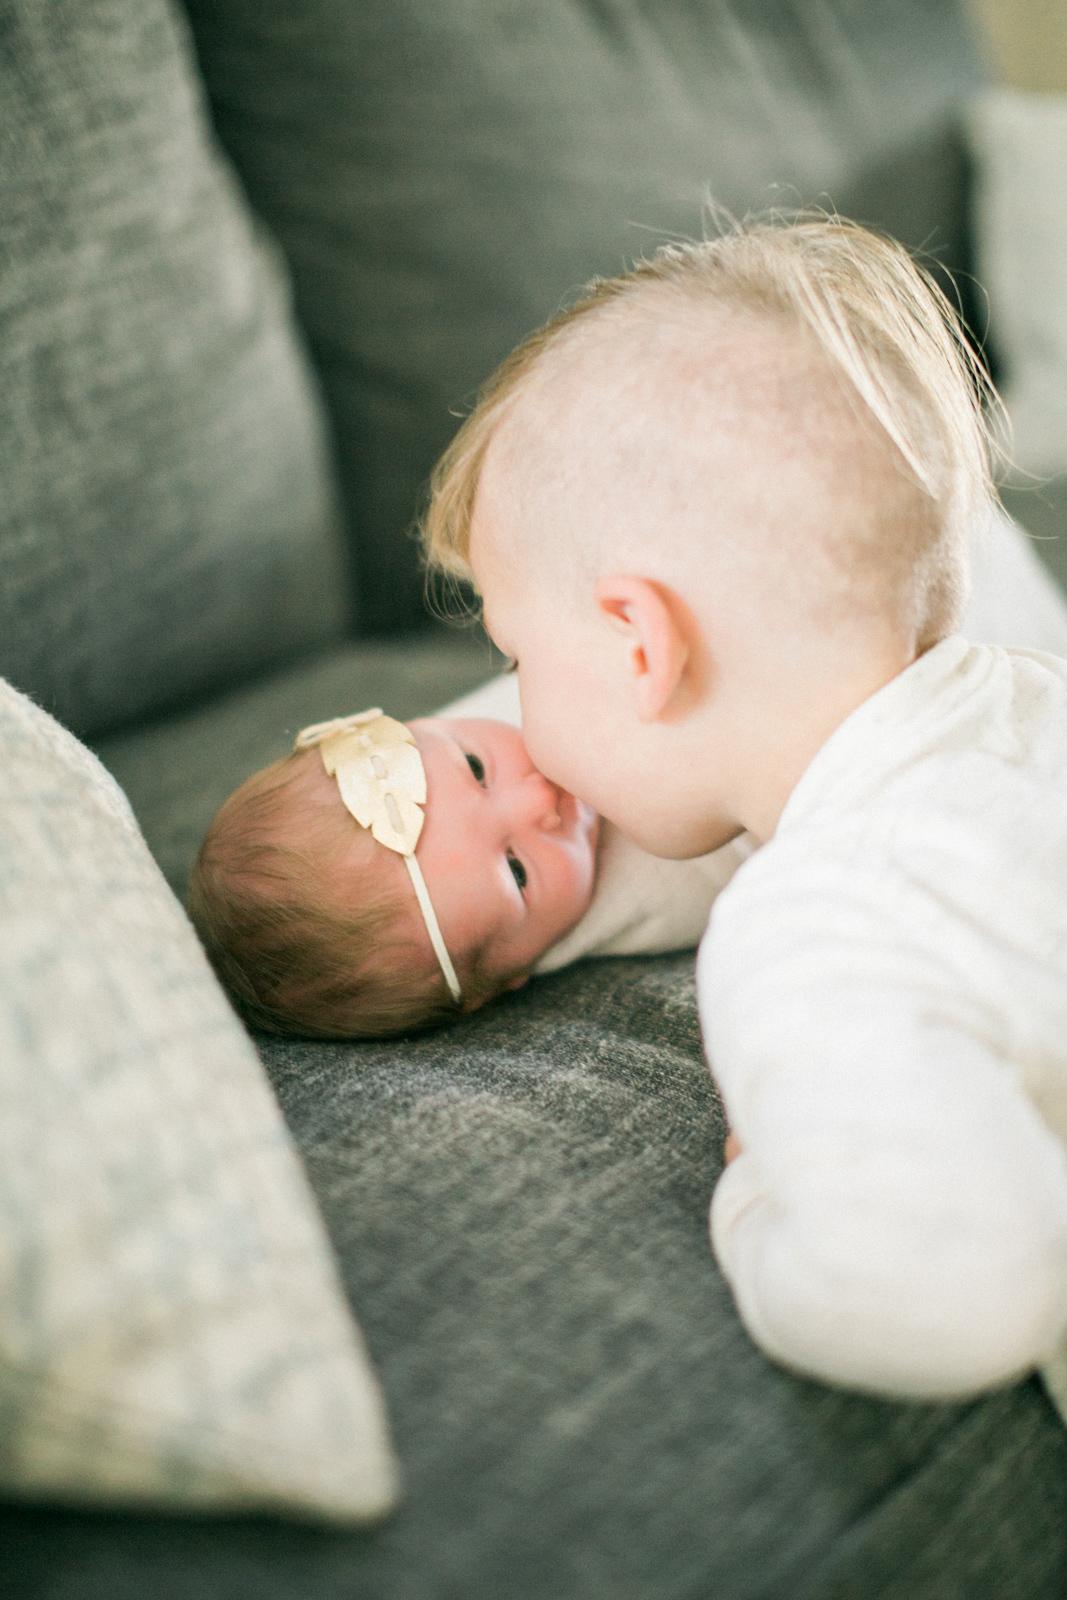 san-diego-newborn-photographer-14.jpg